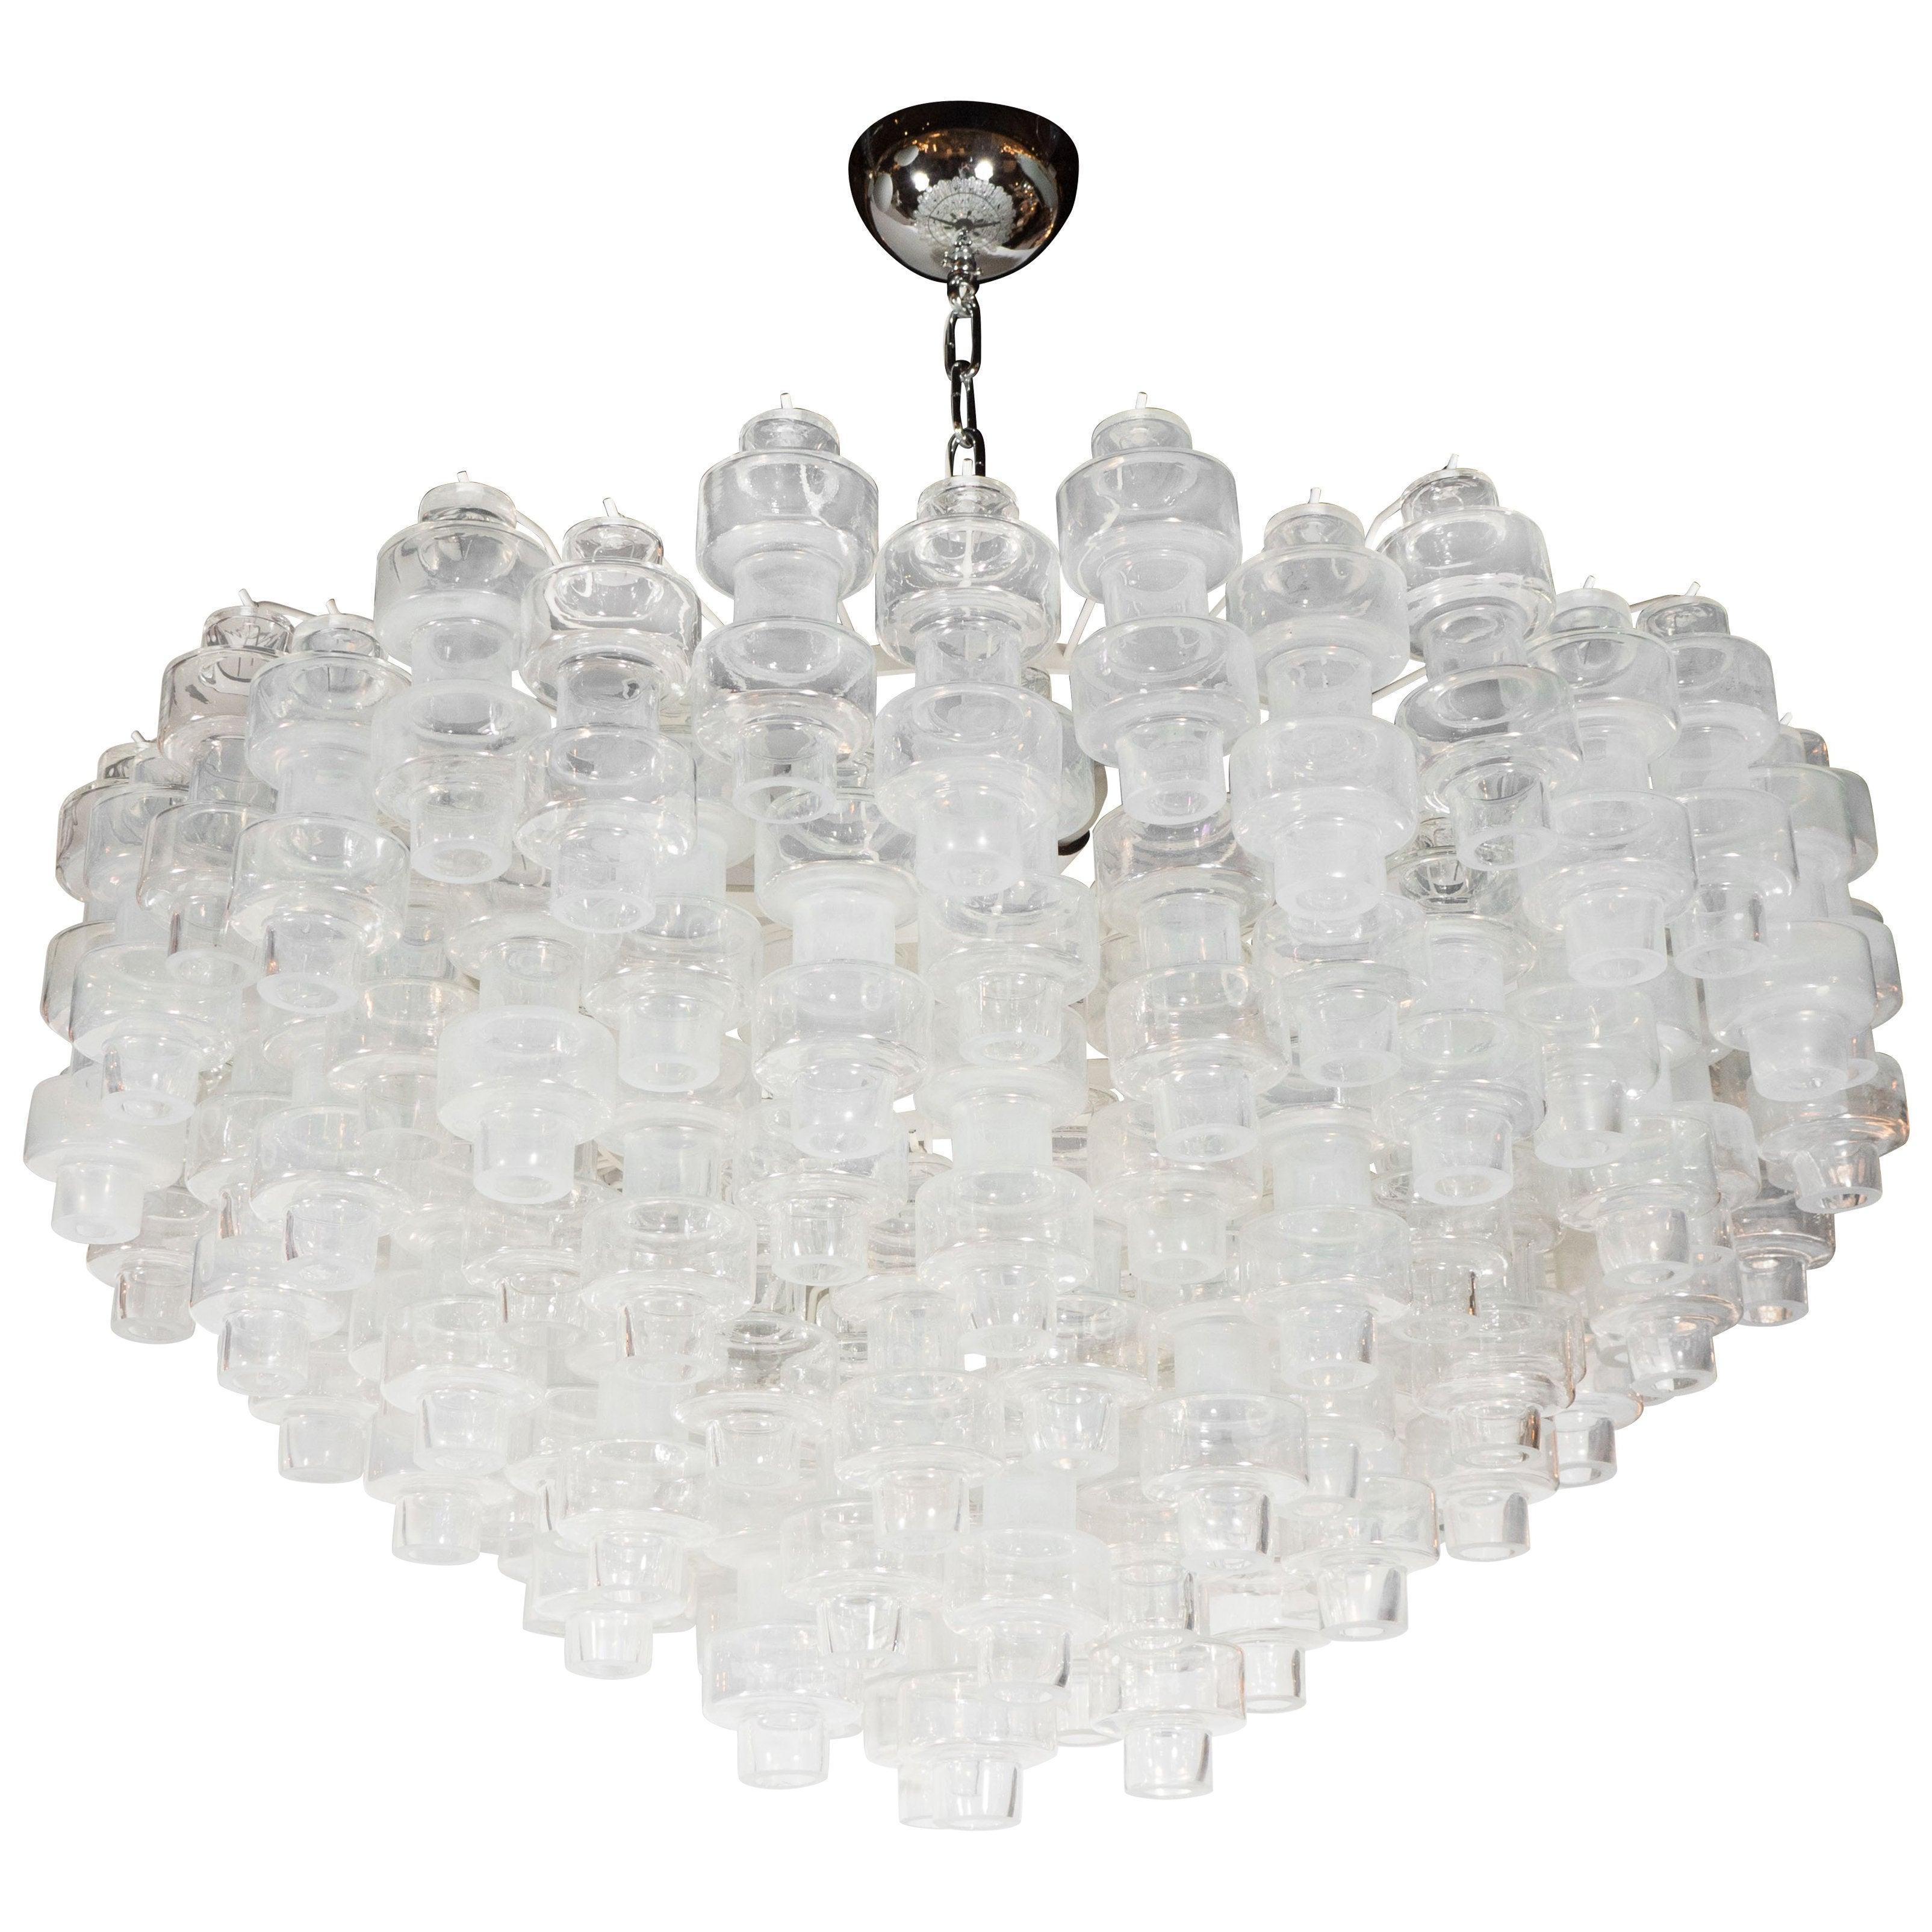 Modernist Opalescent & Clear Handblown Murano Glass Barbell Chandelier